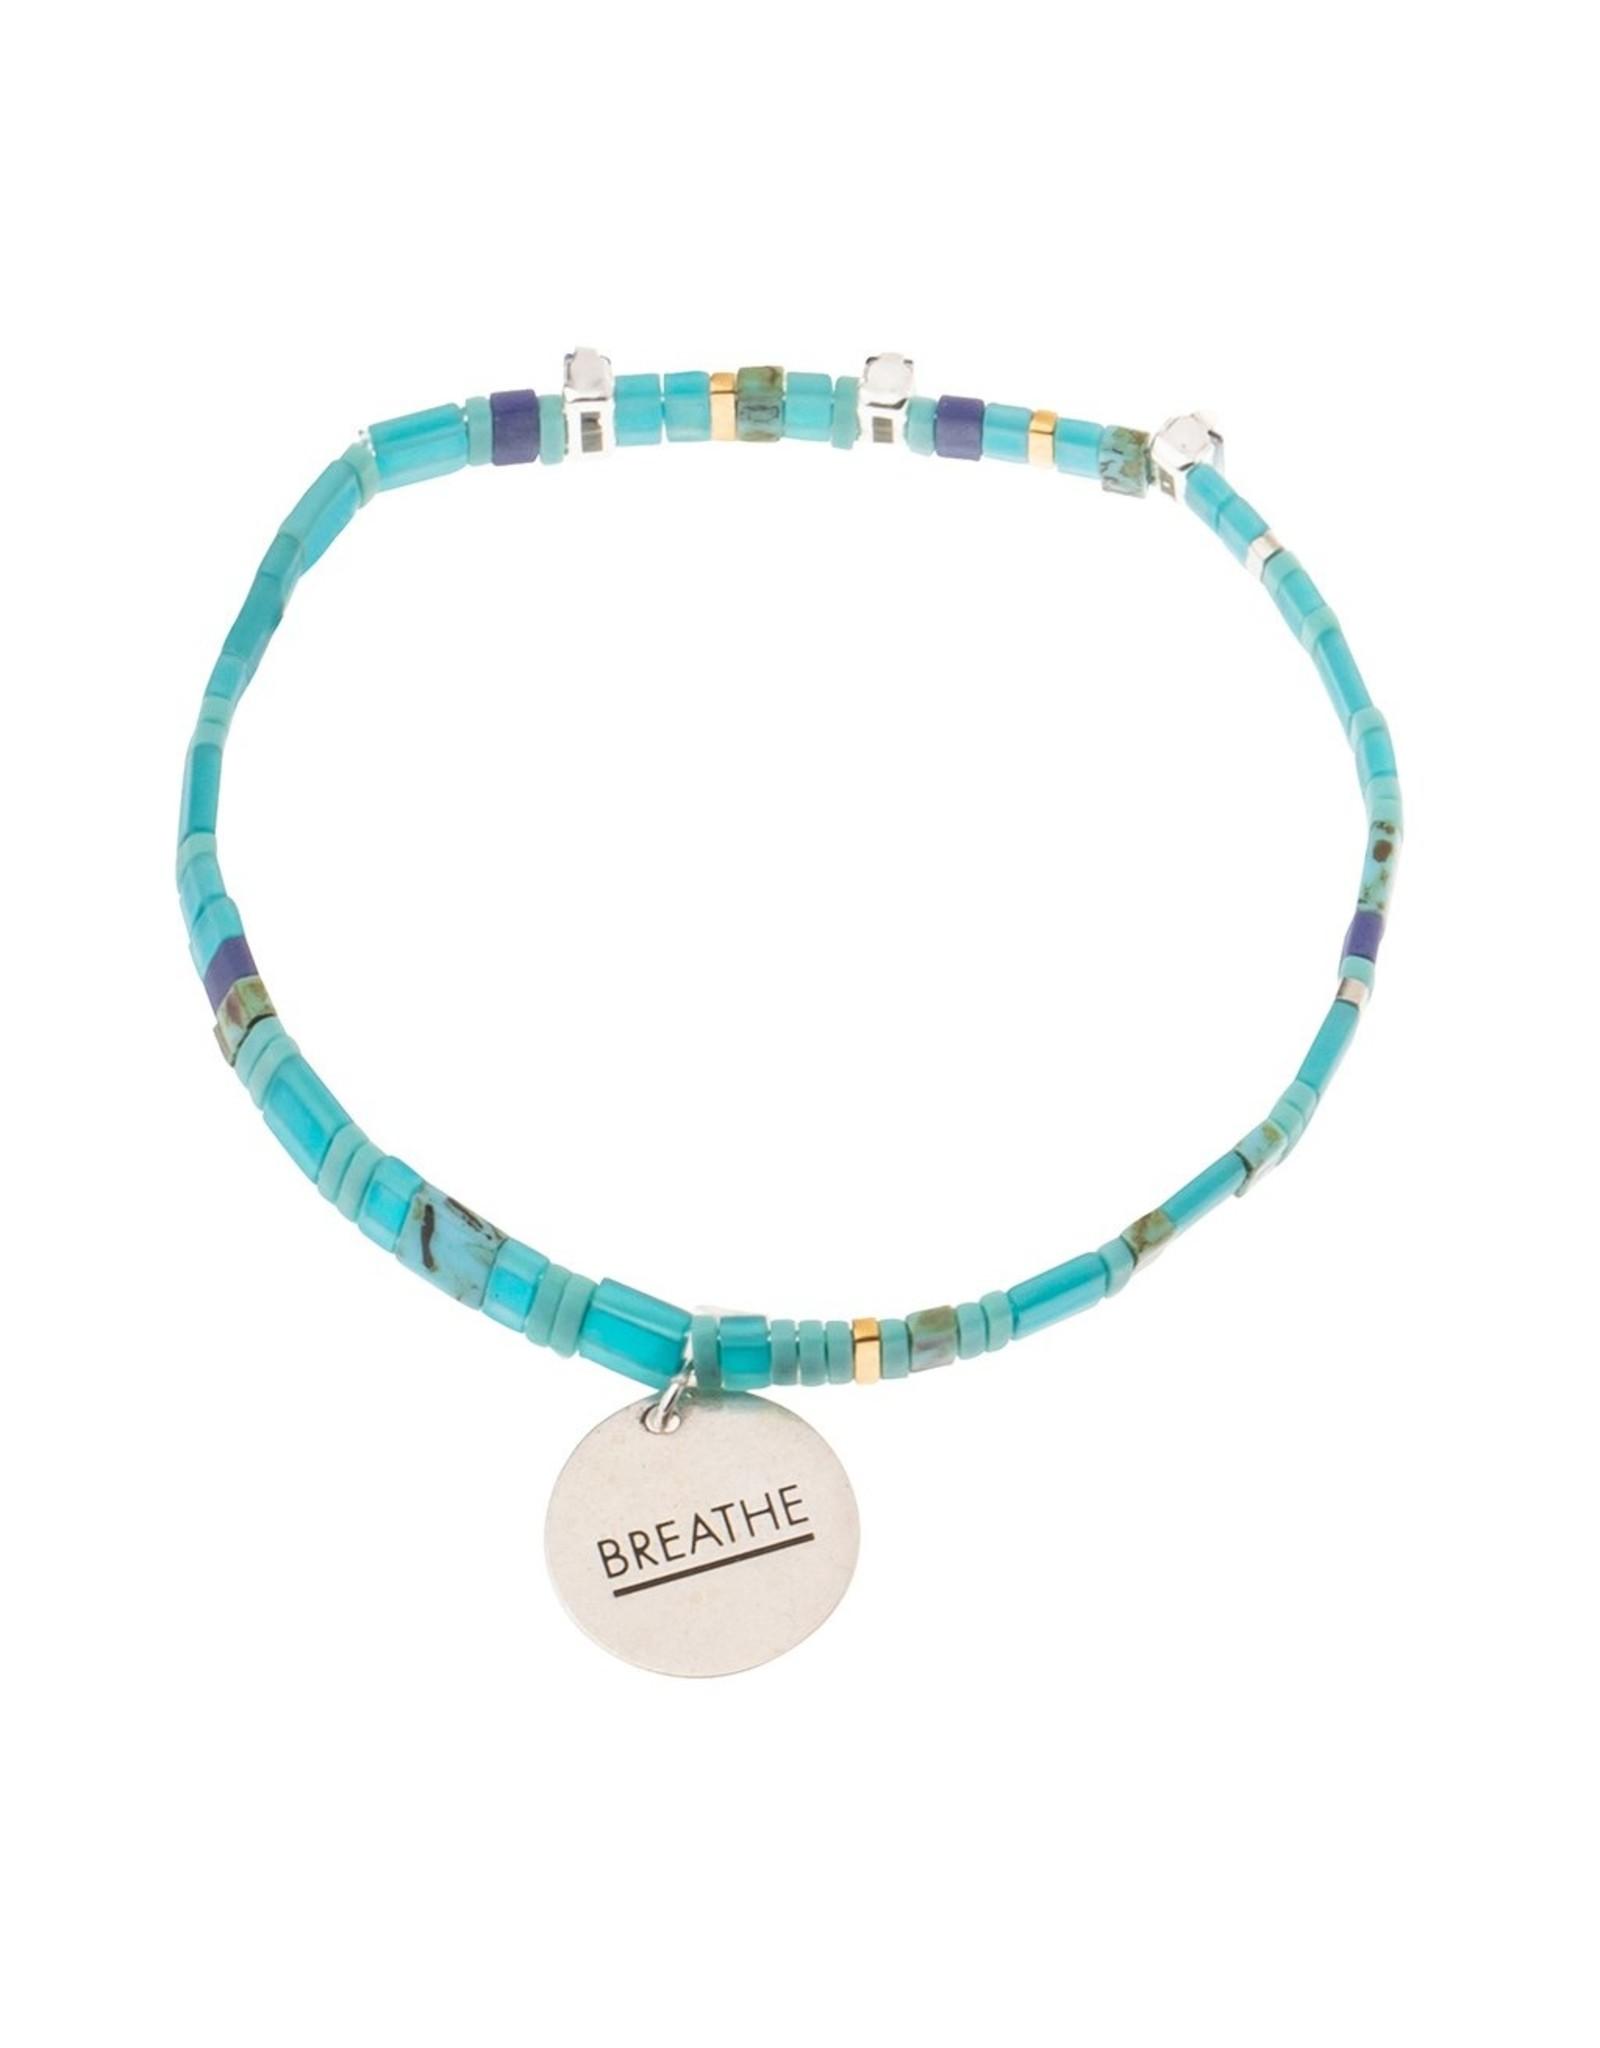 Good Karma Charm Bracelet, Breathe, ocean/sparkle/silver